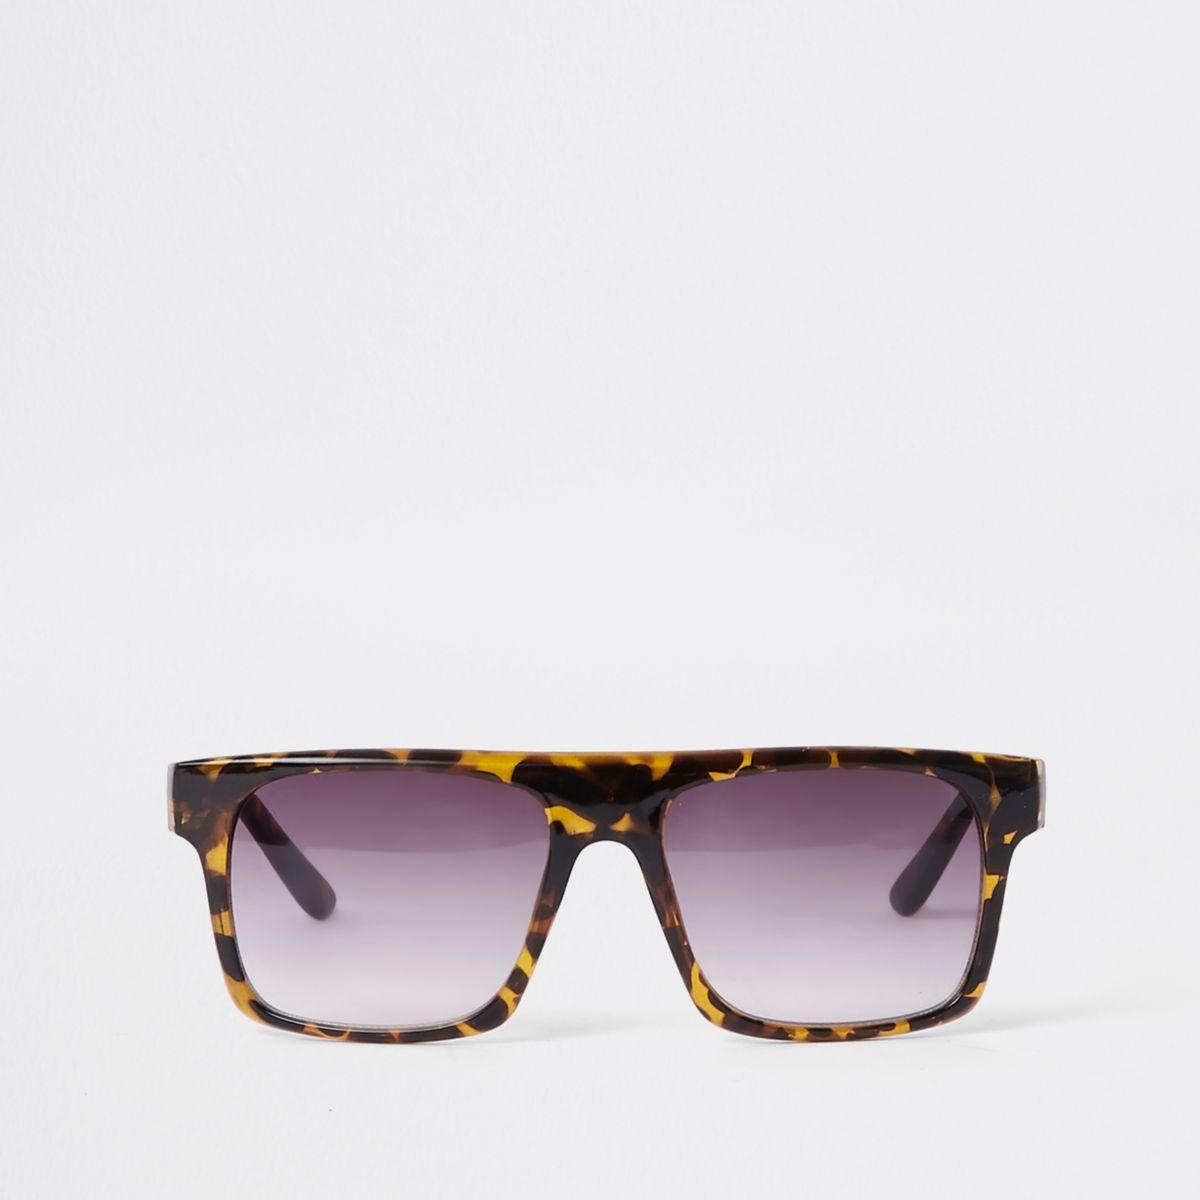 ddbdd50d69c4c4 Bruine zonnebril met schildpadmotief en getinte glazen Bruine zonnebril met  schildpadmotief en getinte glazen ...